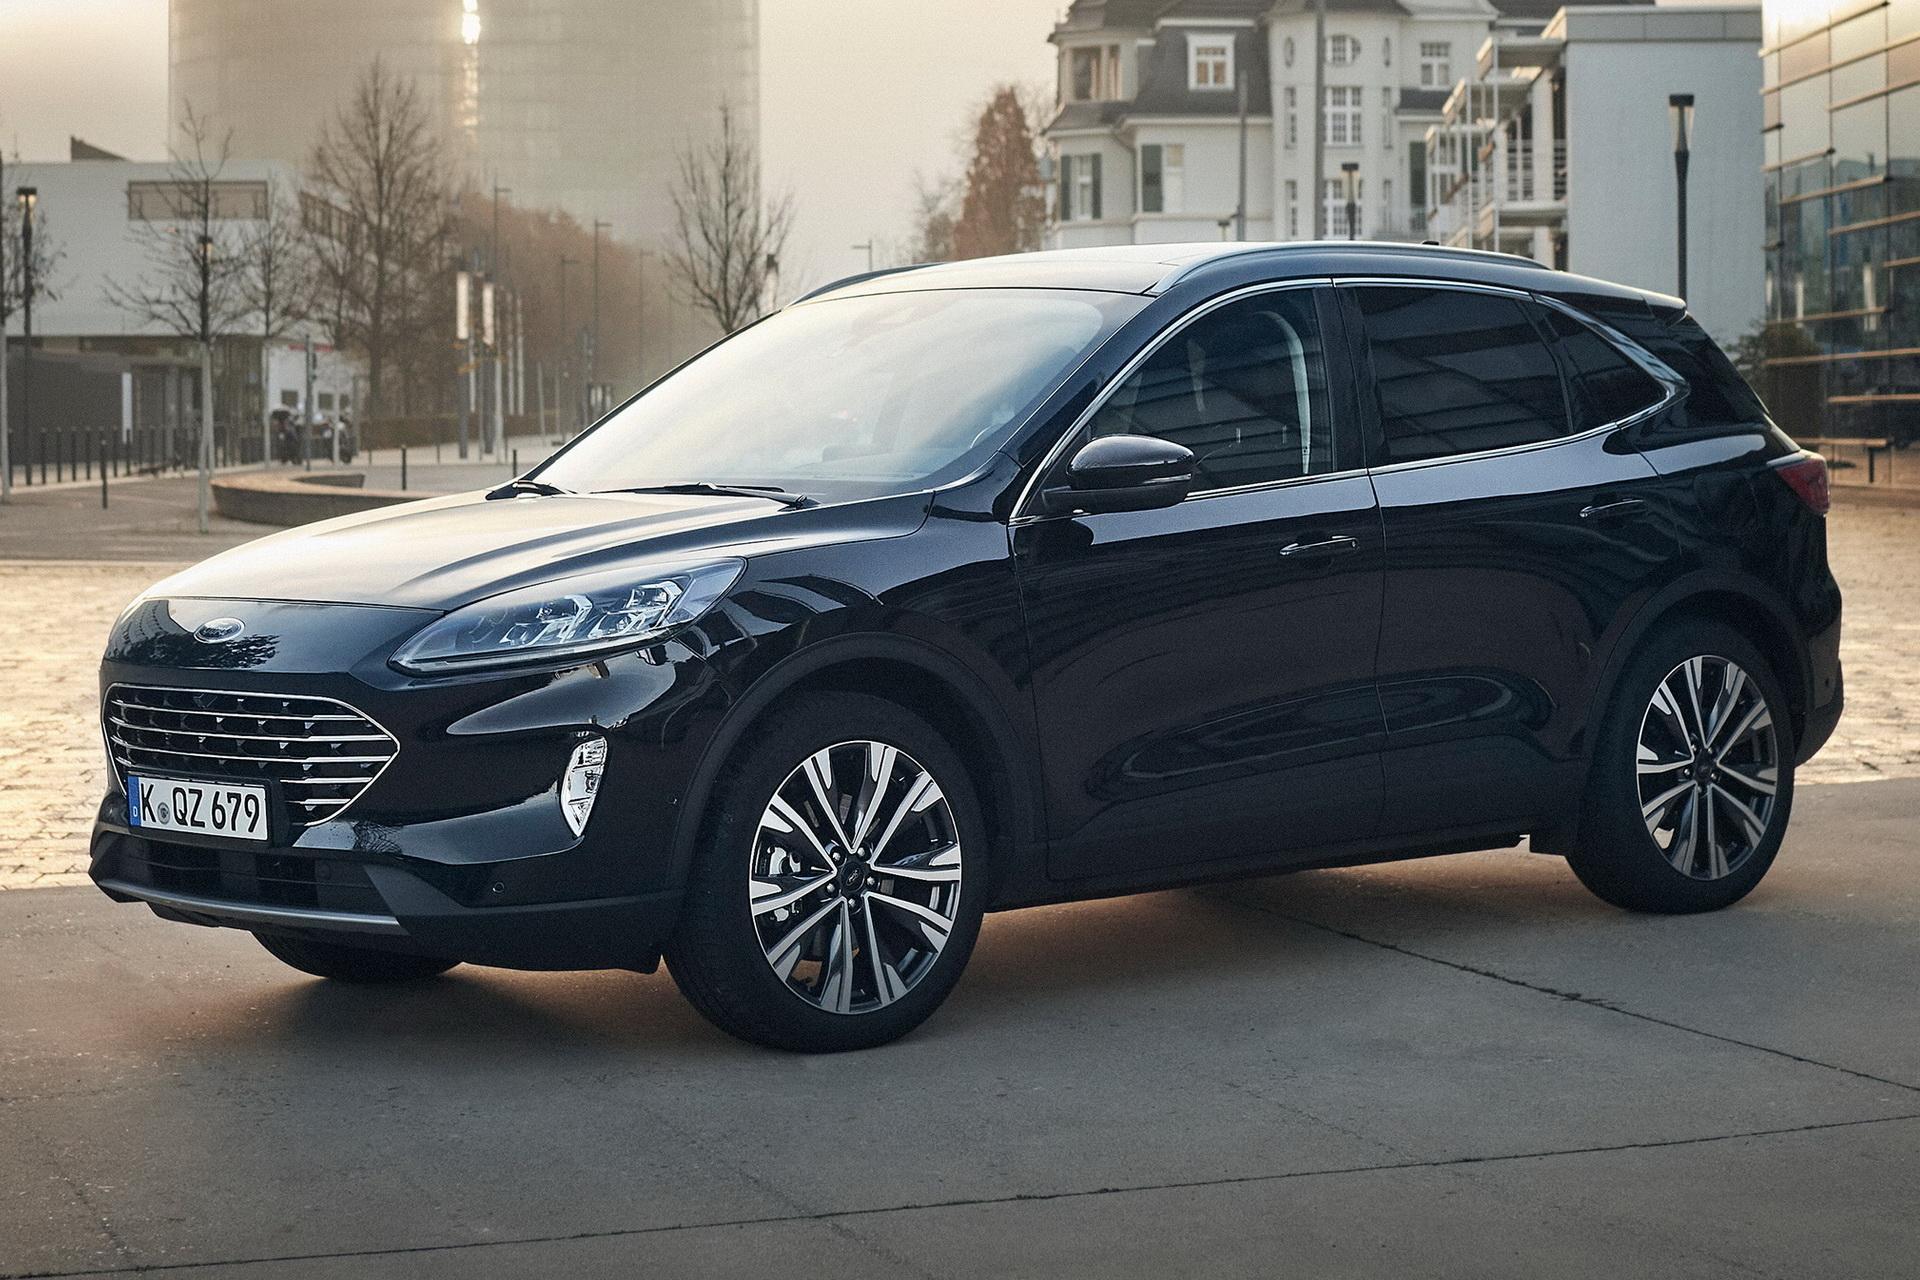 Ford Kuga Hybrid 2021 - Ford Europa - Autopareri